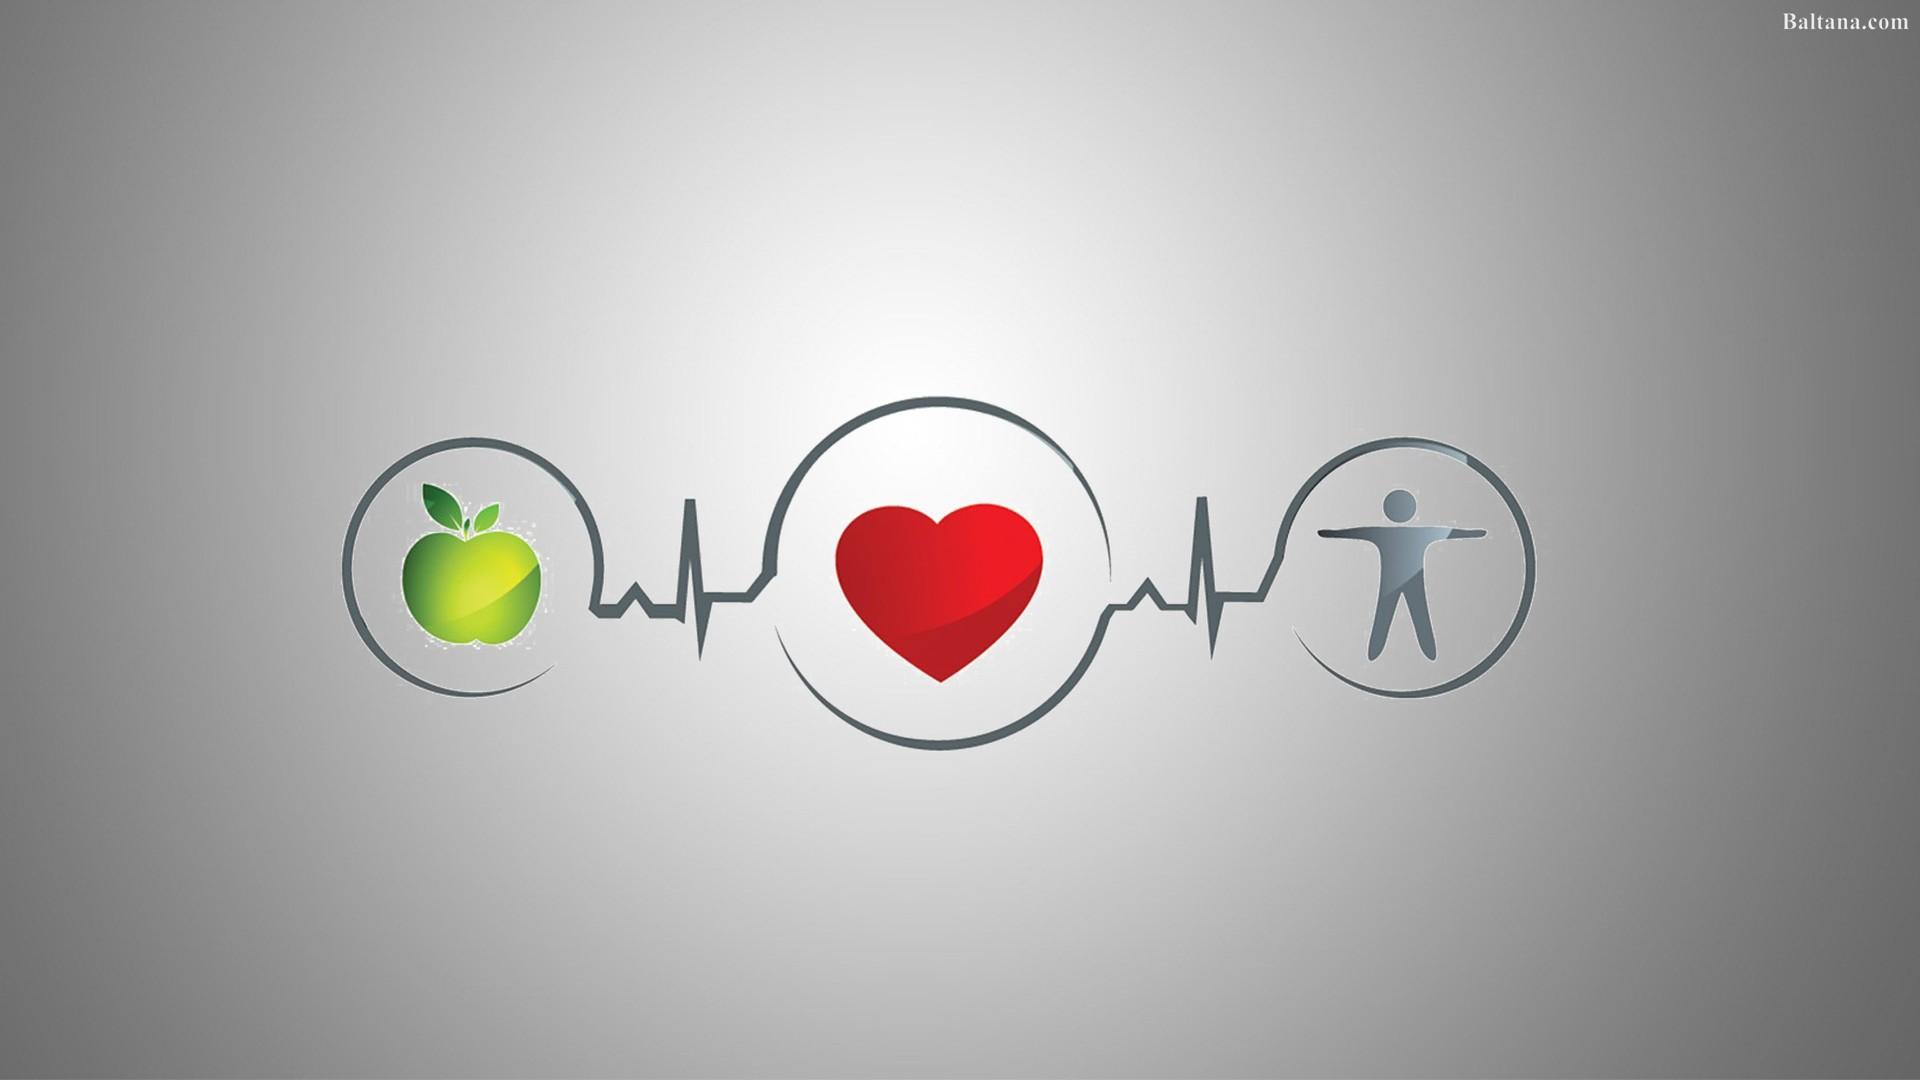 Health Background Wallpaper 29839   Baltana 1920x1080